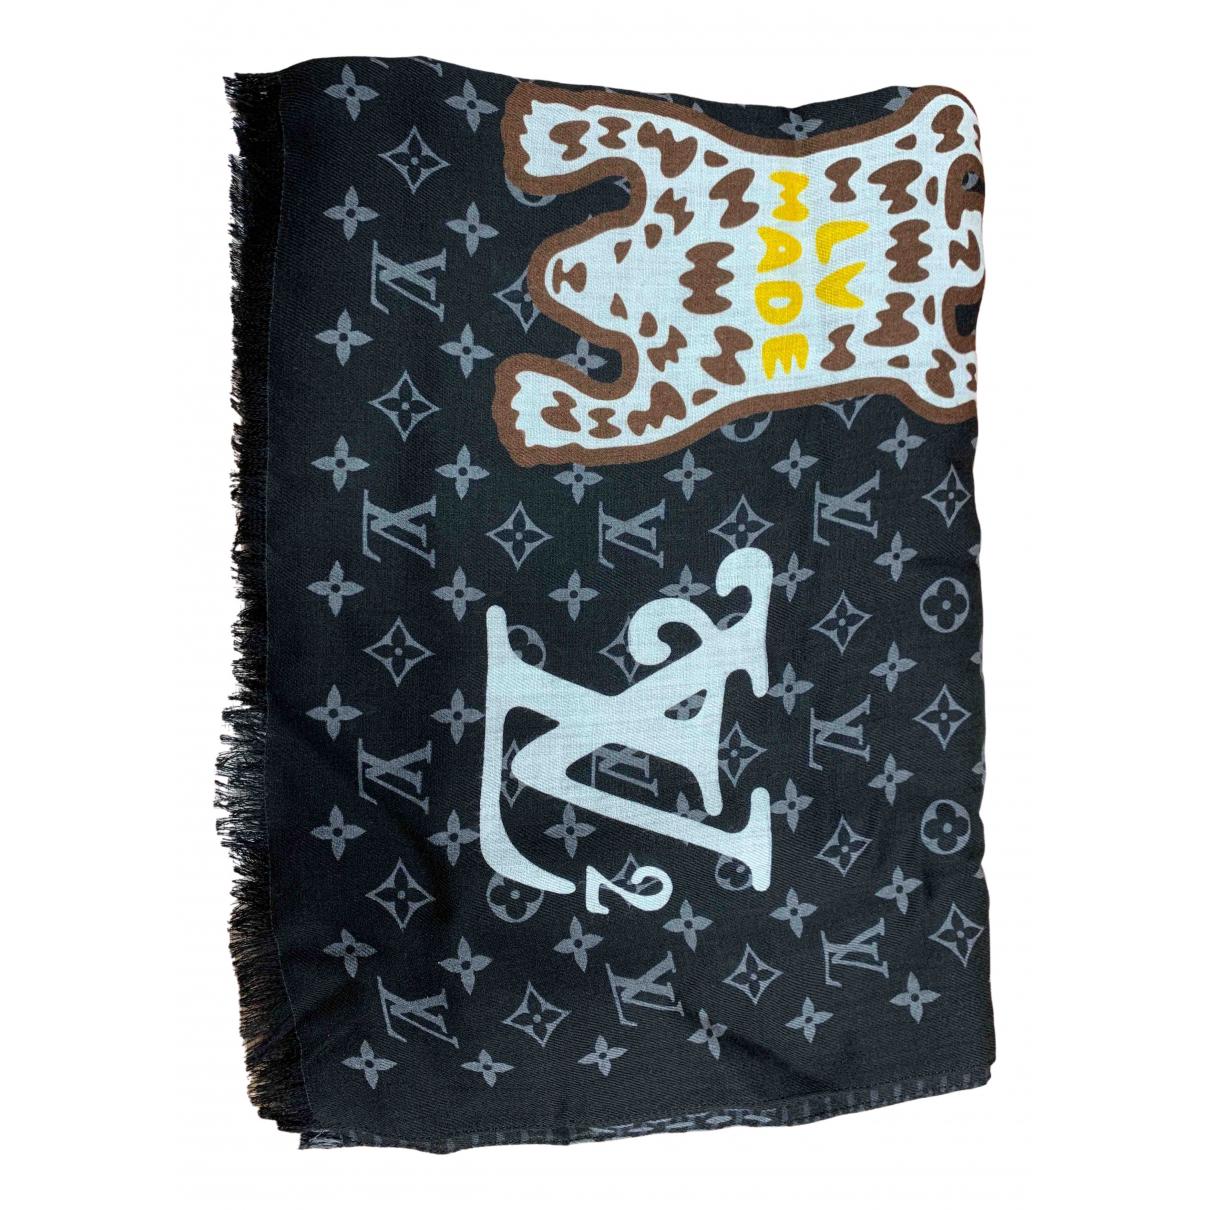 Louis Vuitton X Nigo \N Tuecher, Schal in  Grau Wolle